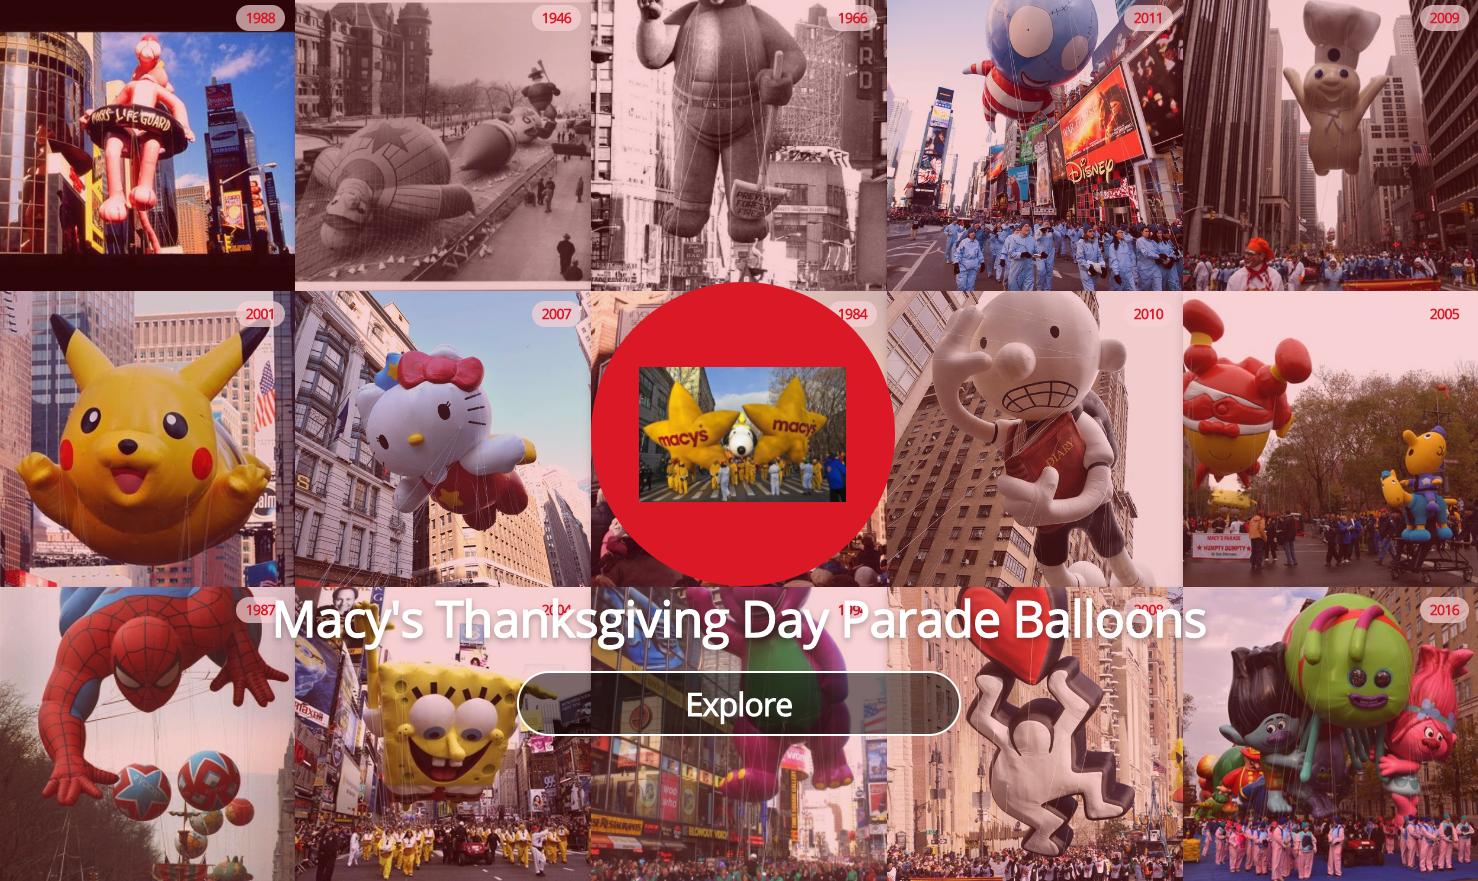 Example: Macy's Balloons